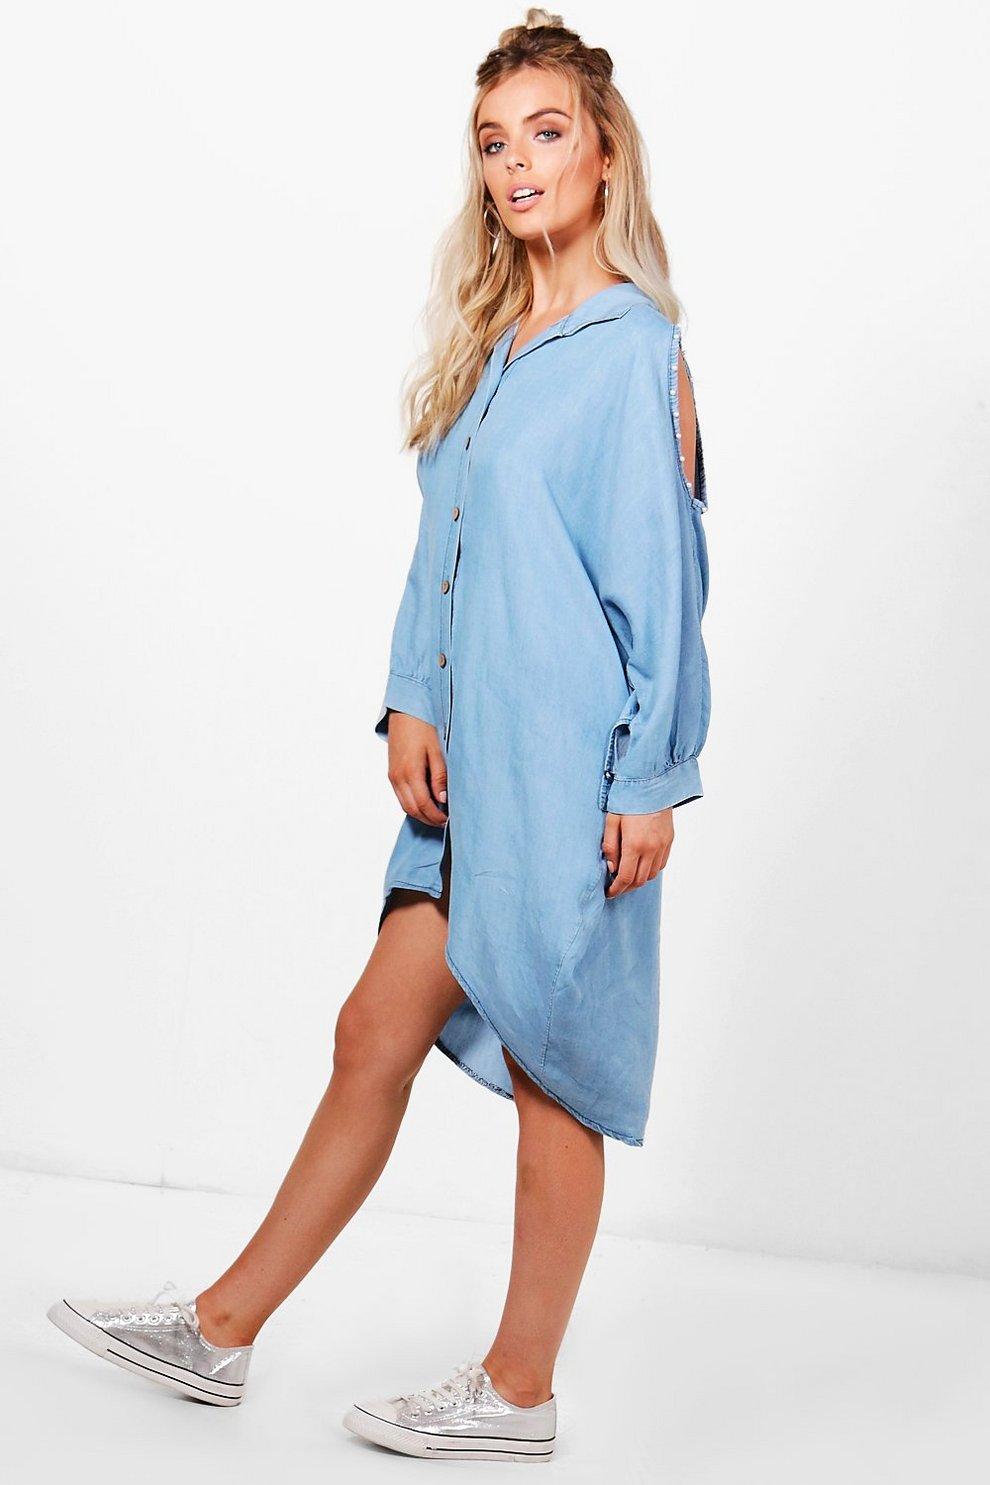 8db4f0196c39 Kandy Pearl Trim Open Shoulder Denim Shirt Dress